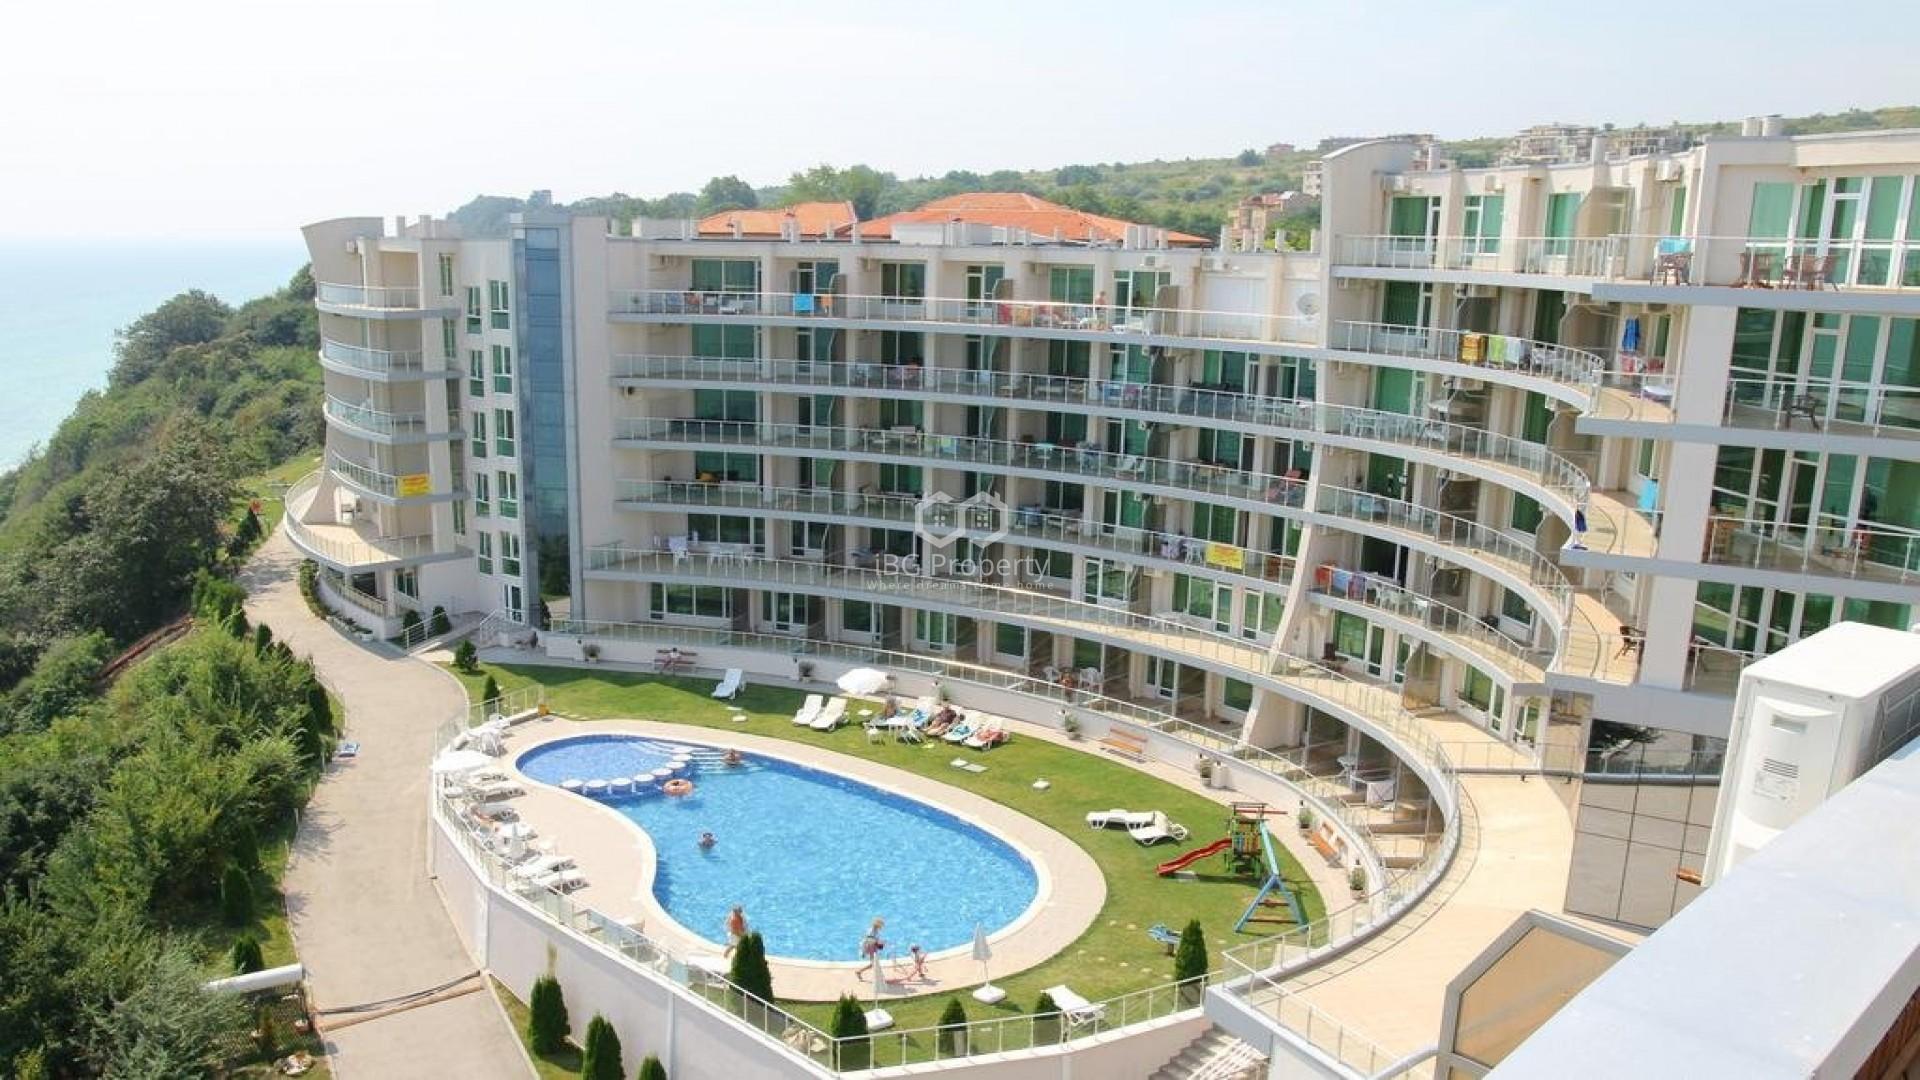 Tристаен апартамент Бяла 110 m2